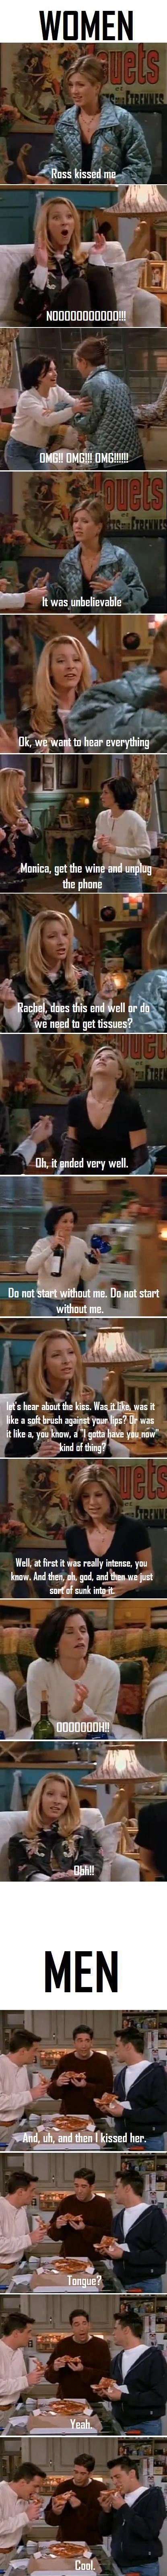 "One big difference between Women & Men - ""Friends"" - Rachel and Ross kiss. ;)"